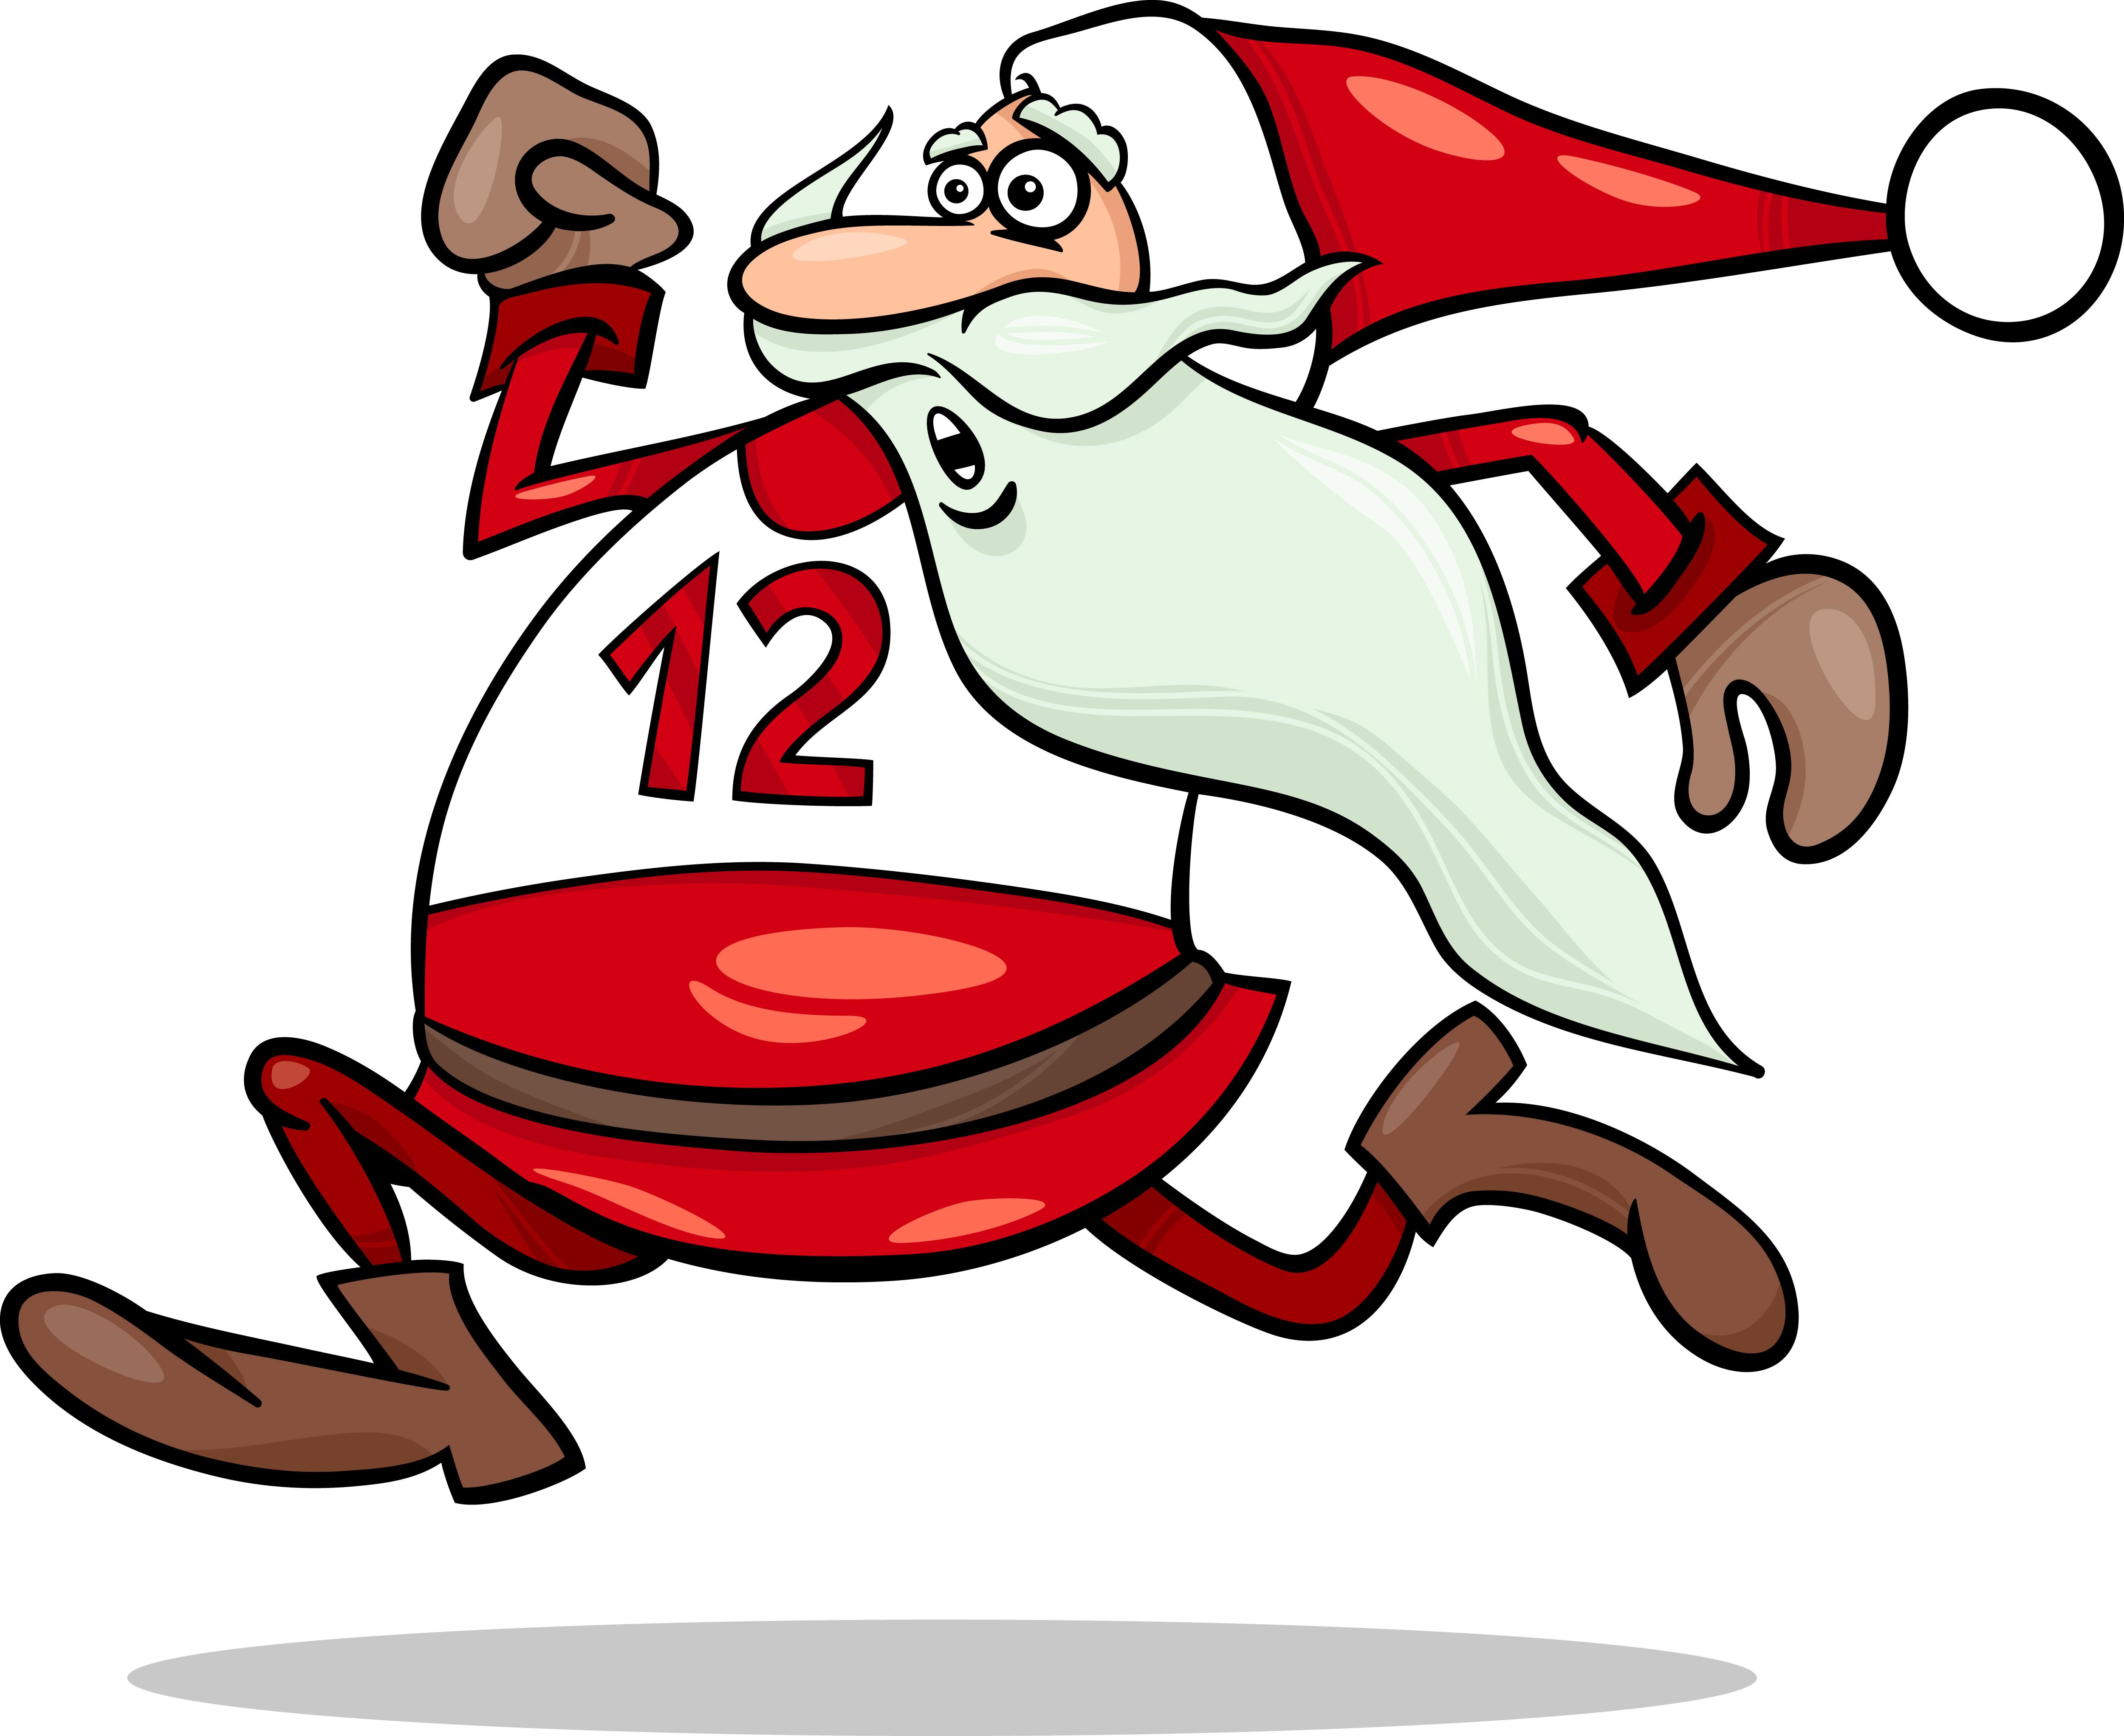 images.raceentry.com/infopages/care-for-kids-santa-sleigh-run-5k-infopages-2060.jpg